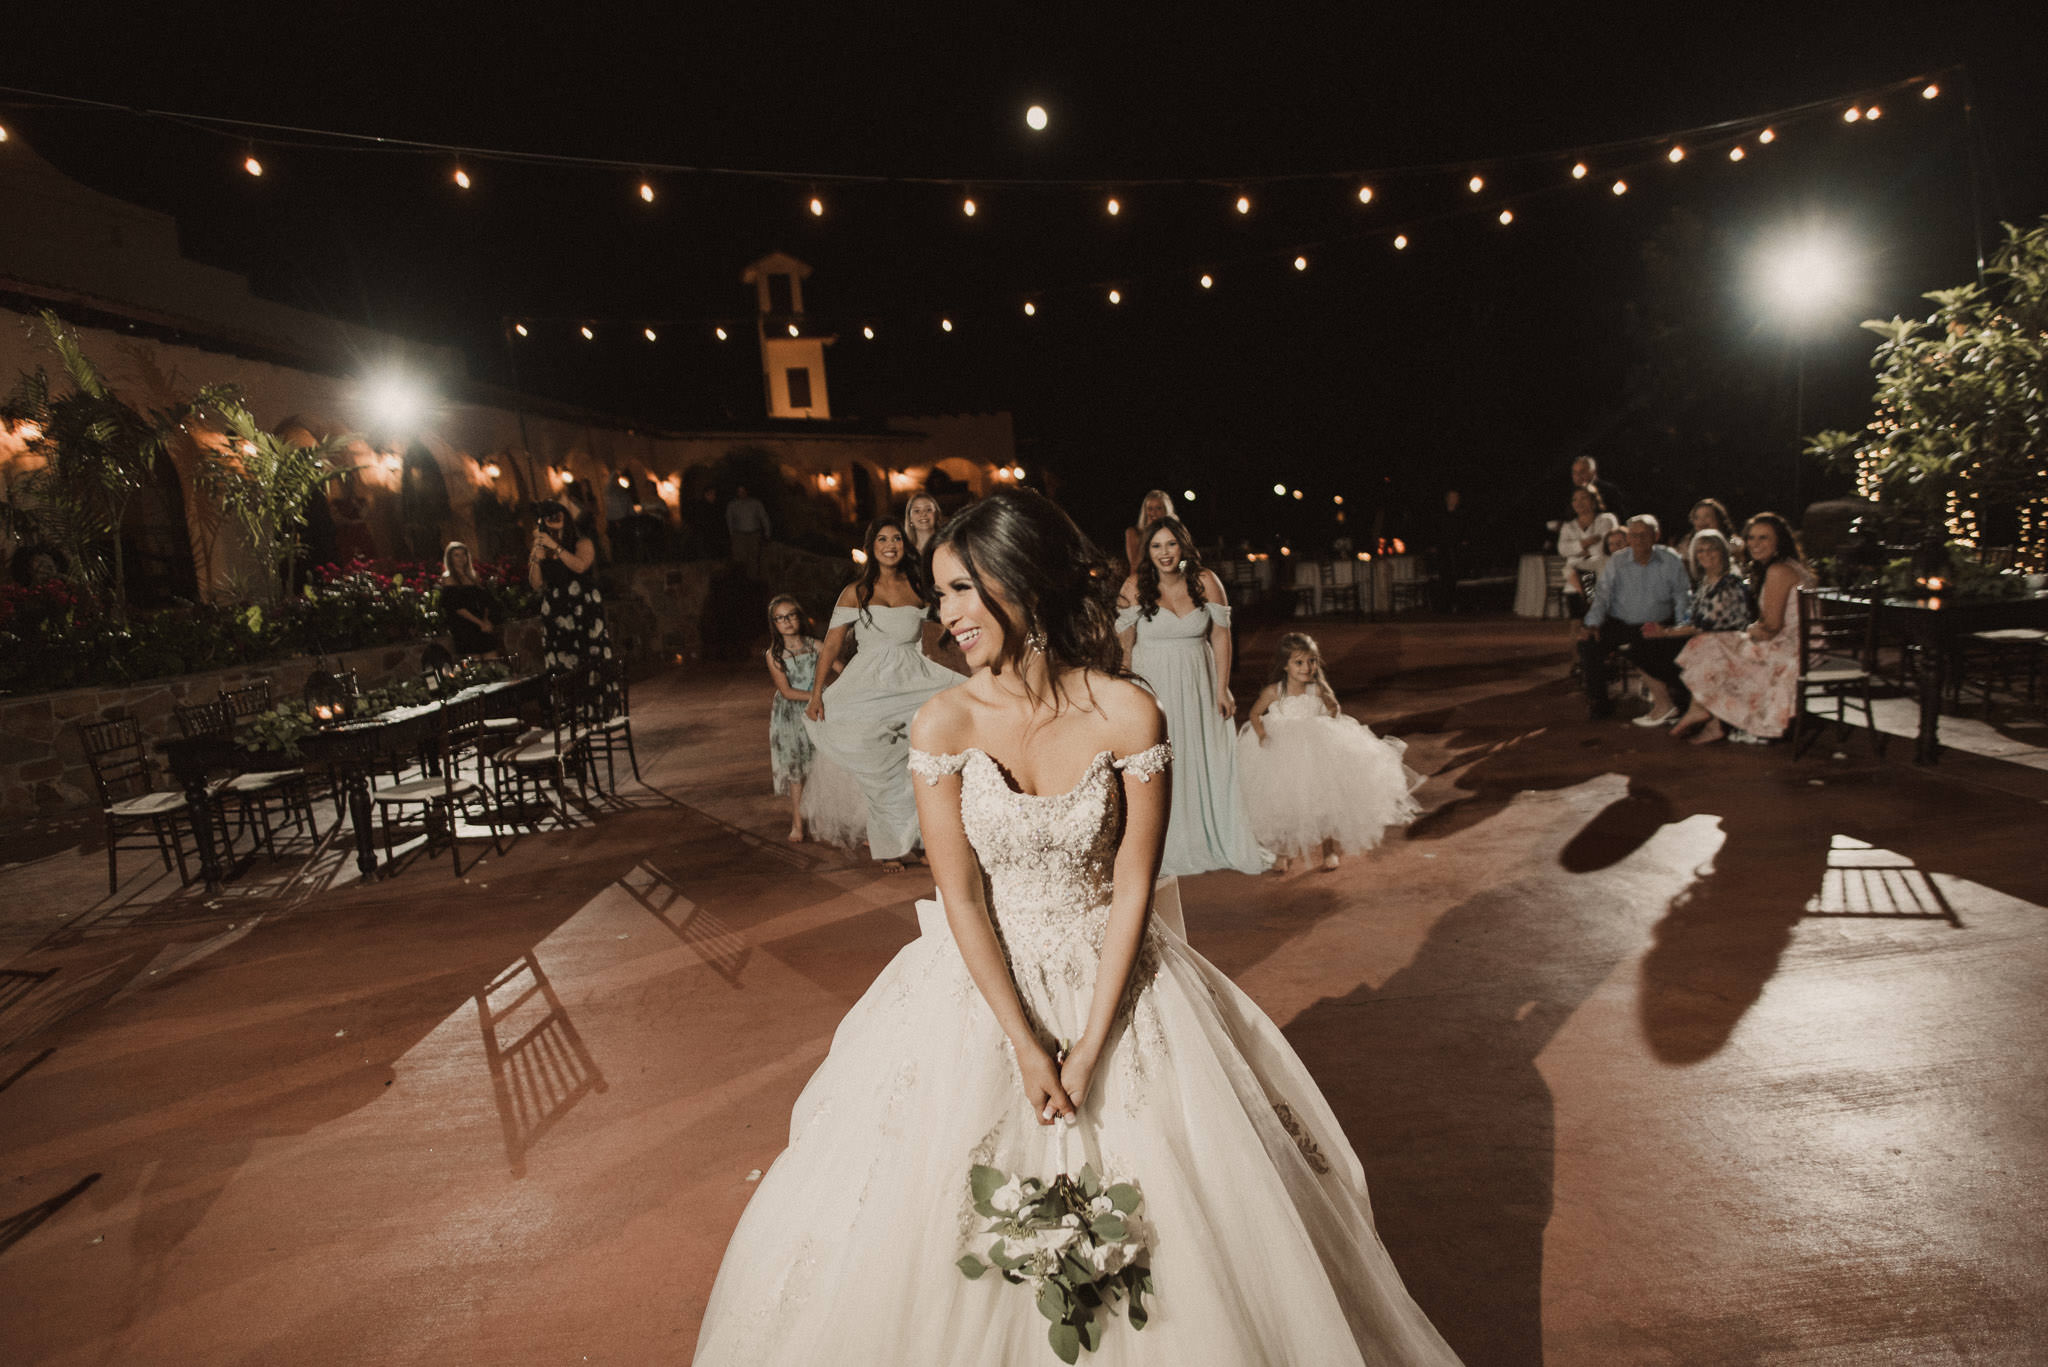 adriana-christian-wedding-re-sm-148.jpg